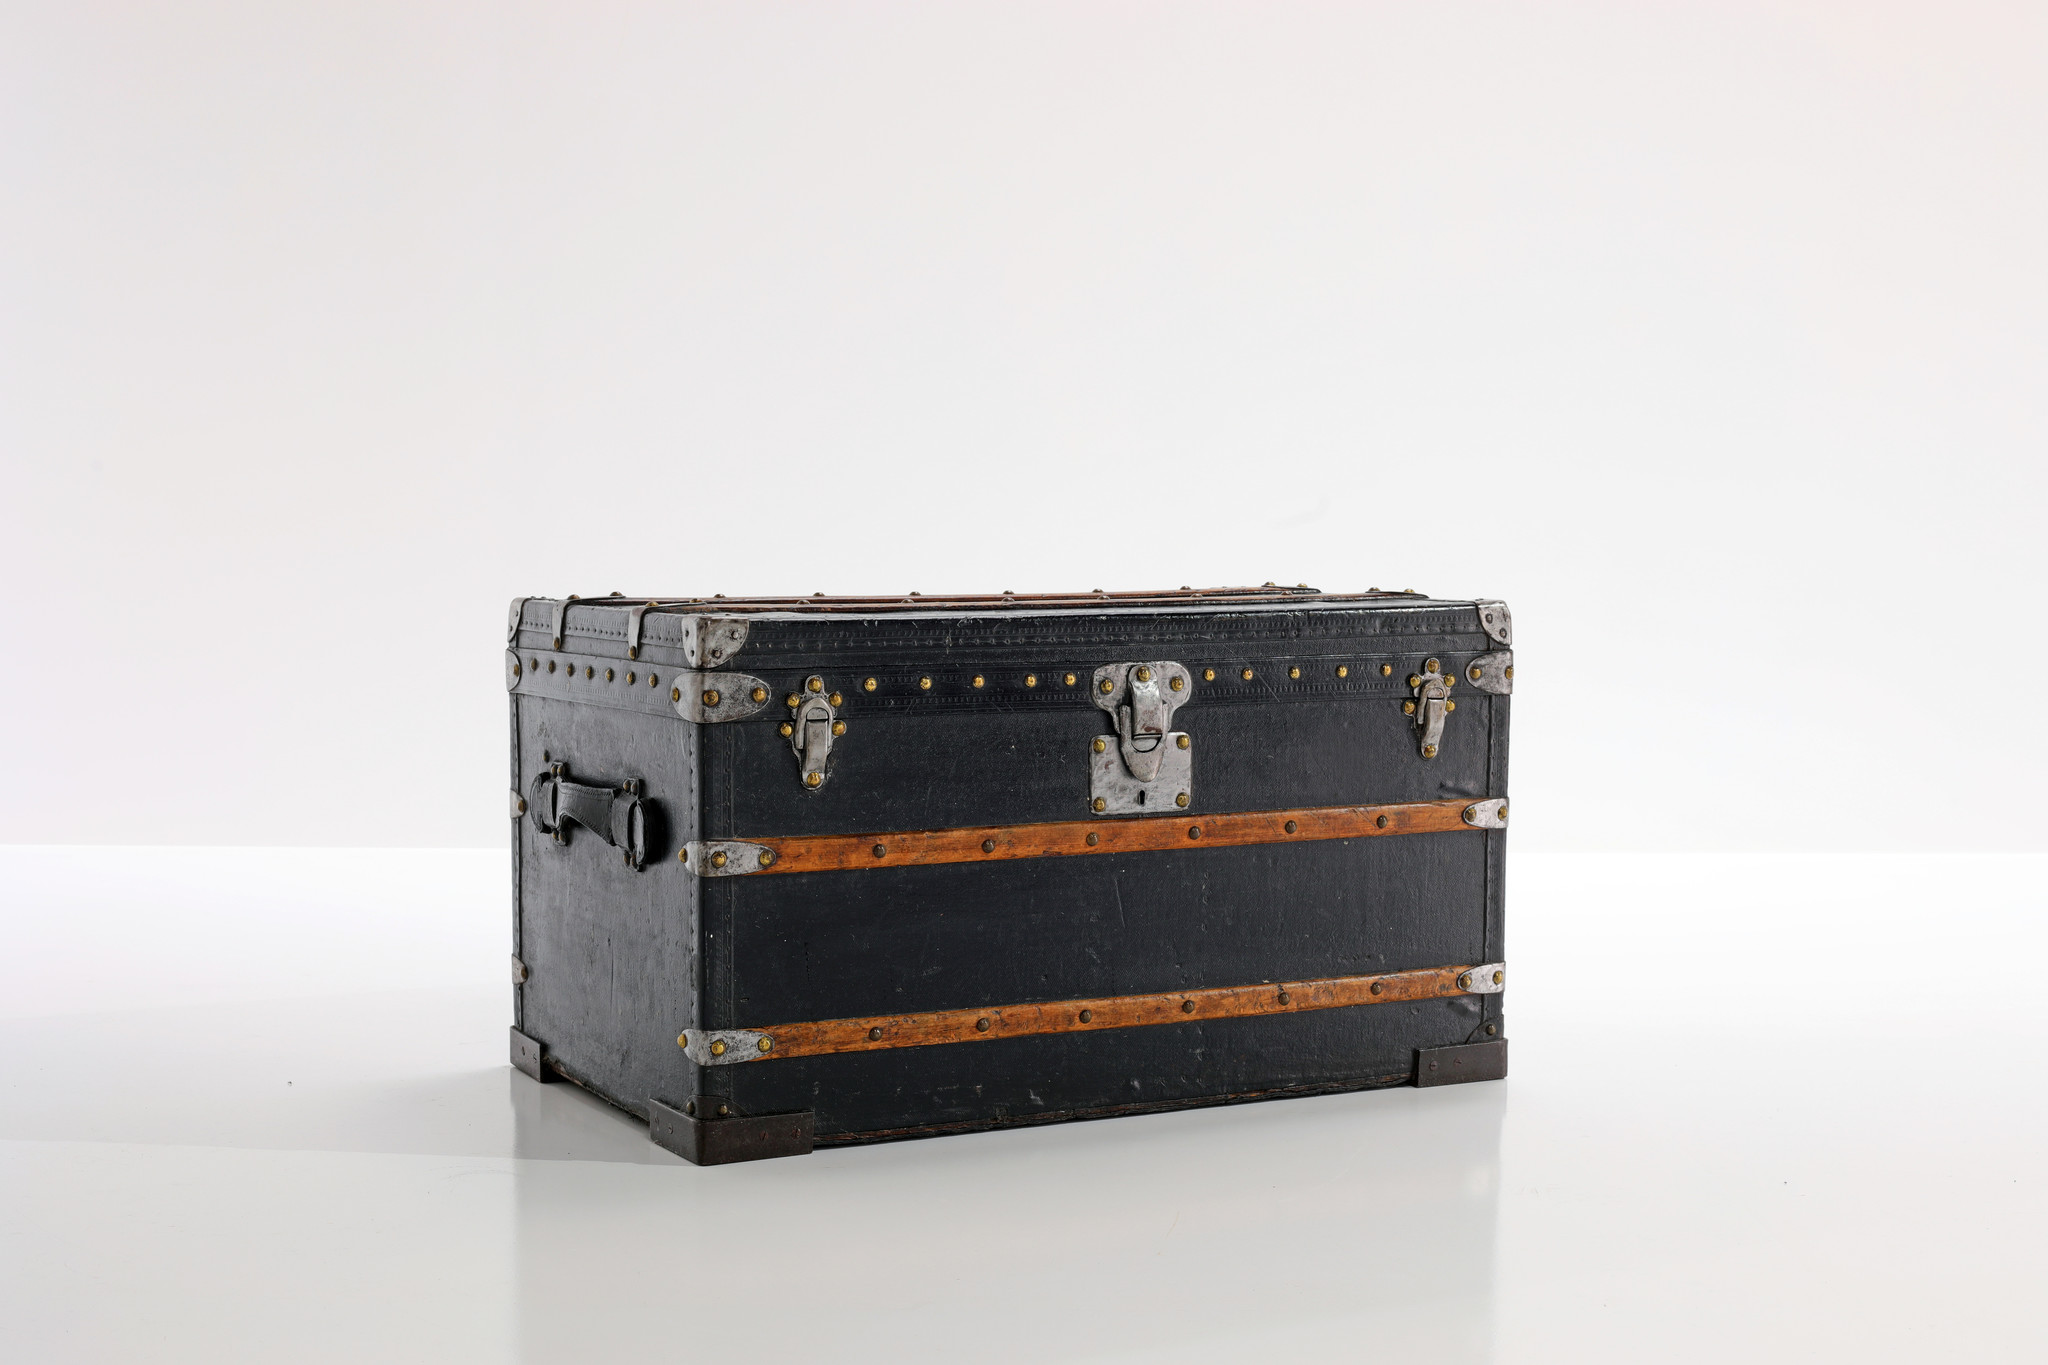 Louis Vuitton trunk, 1920's